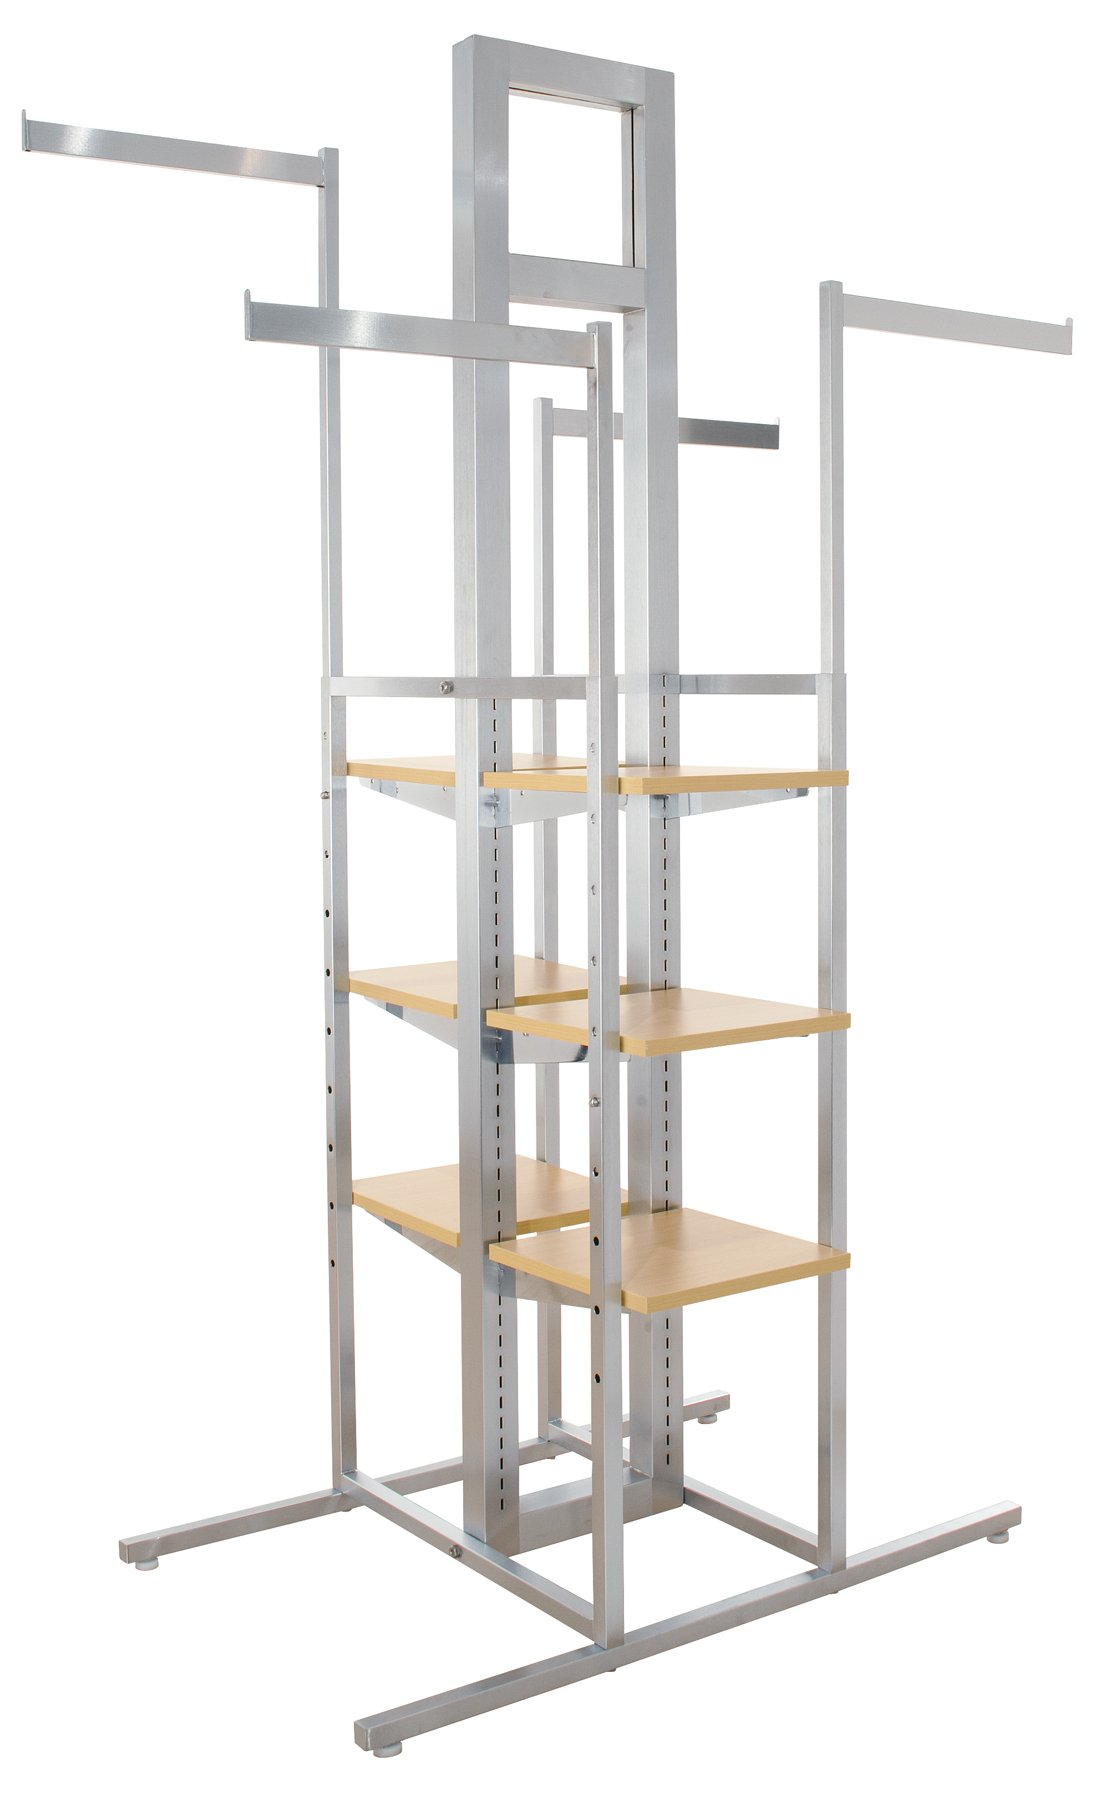 Econoco Cross Merchandising 4-Way Rack, 44'' Length x 24'' Width x 72'' Height by Econoco (Image #1)